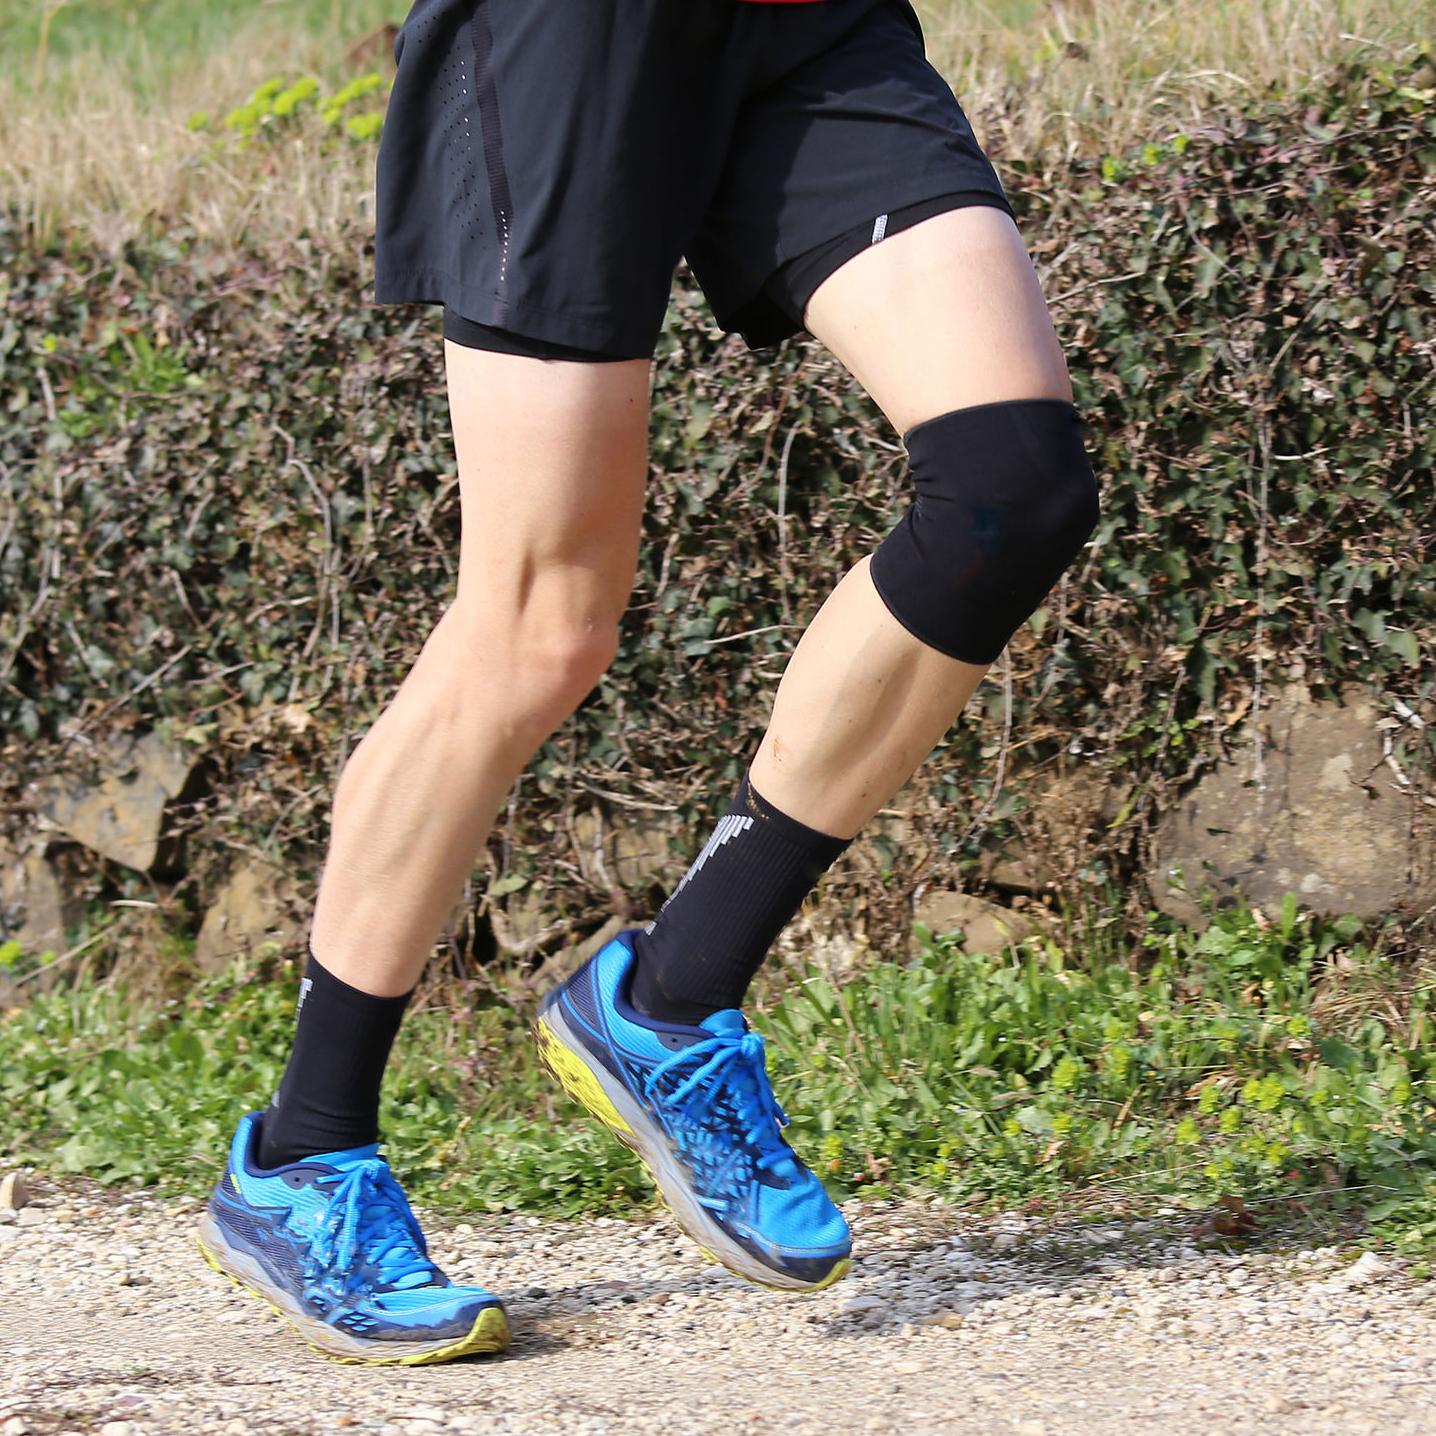 Rodillera knee sleeve-cob con filamentos de cobre BN4615